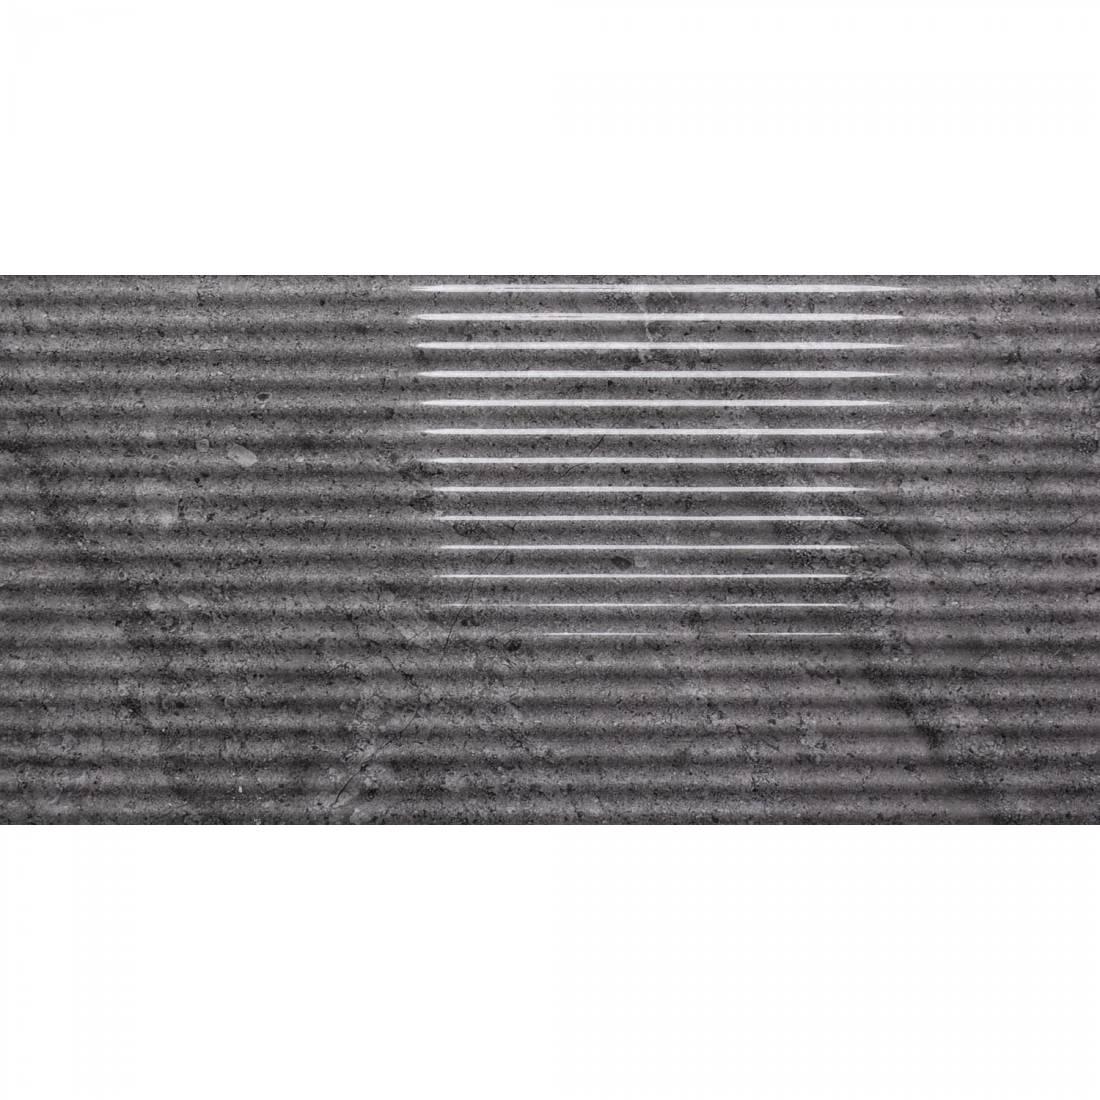 Cotswold Relief Decor 30x60 Dark Grey 1